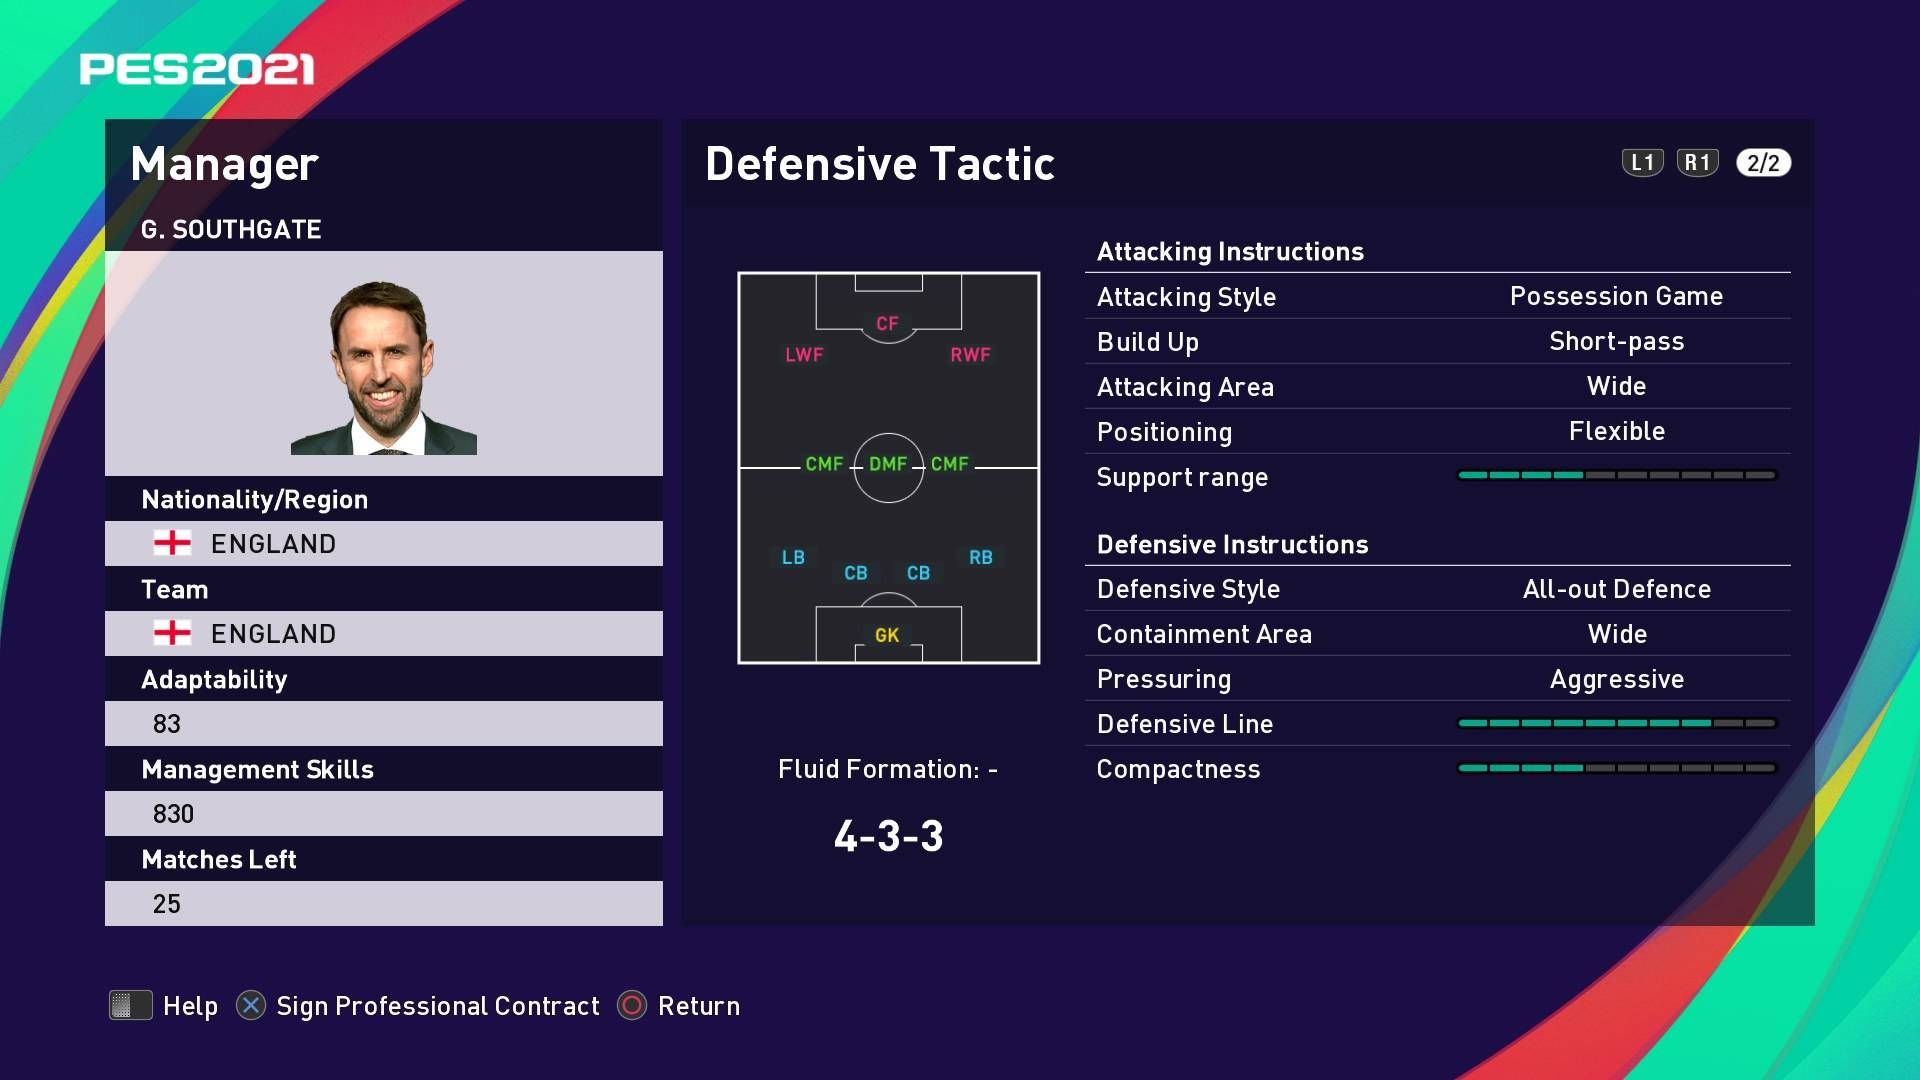 G. Southgate (Gareth Southgate) Defensive Tactic in PES 2021 myClub